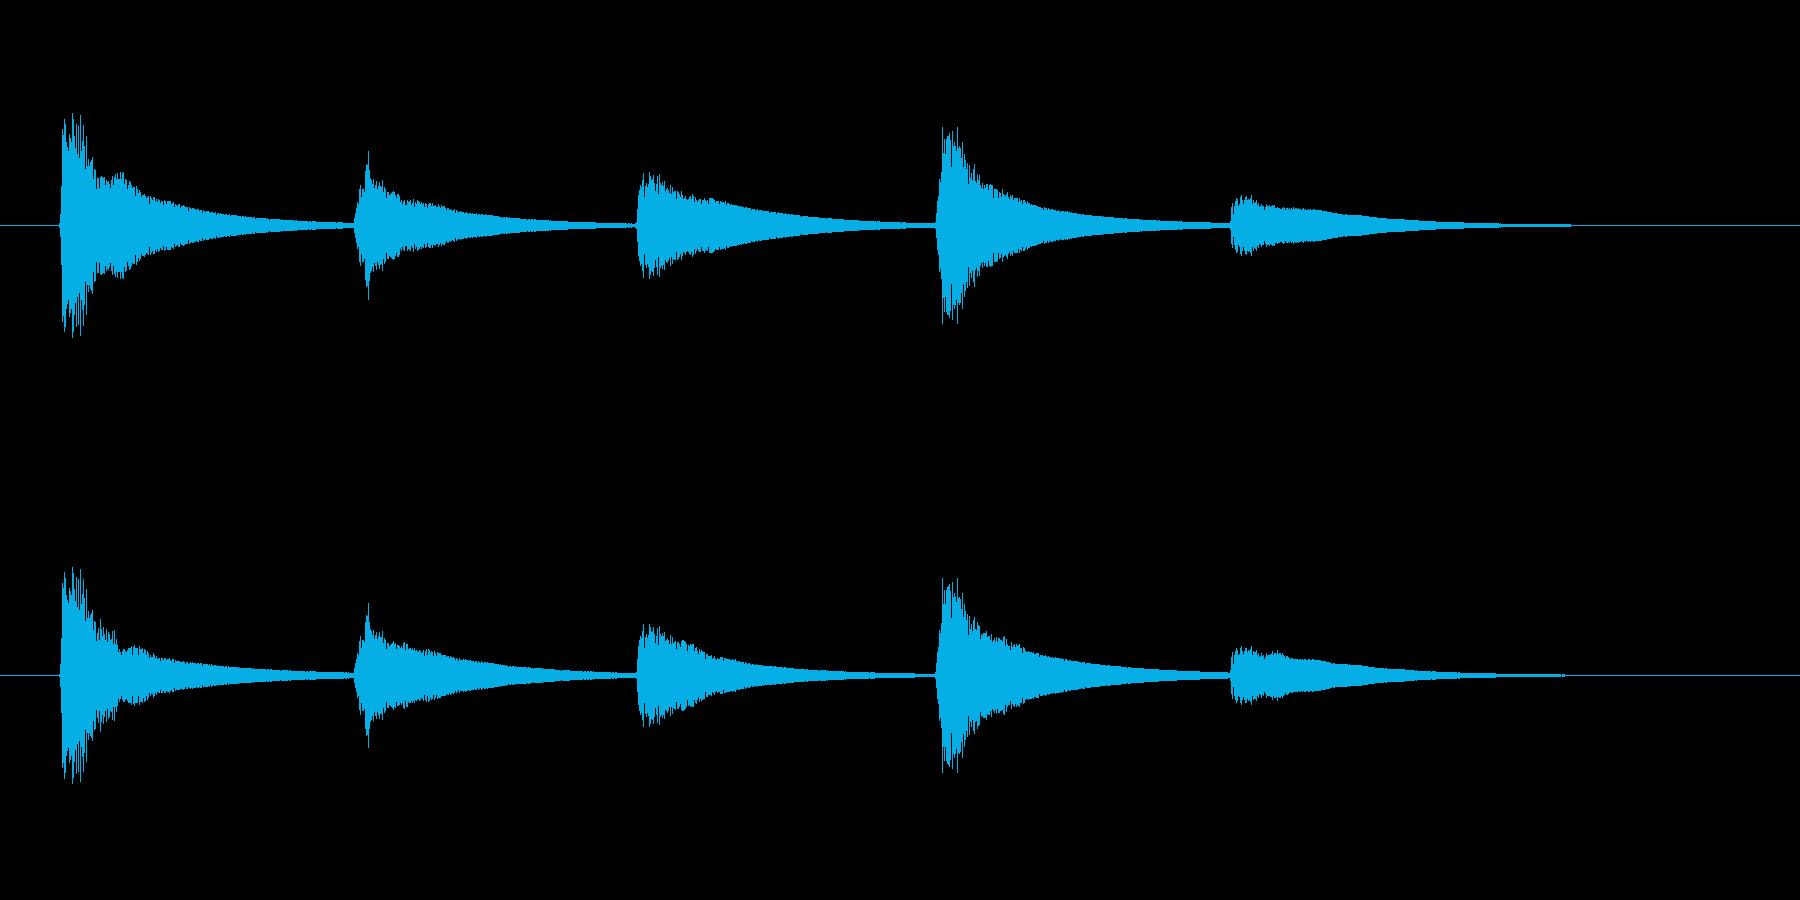 【SE 効果音】ティロティリロリン6の再生済みの波形